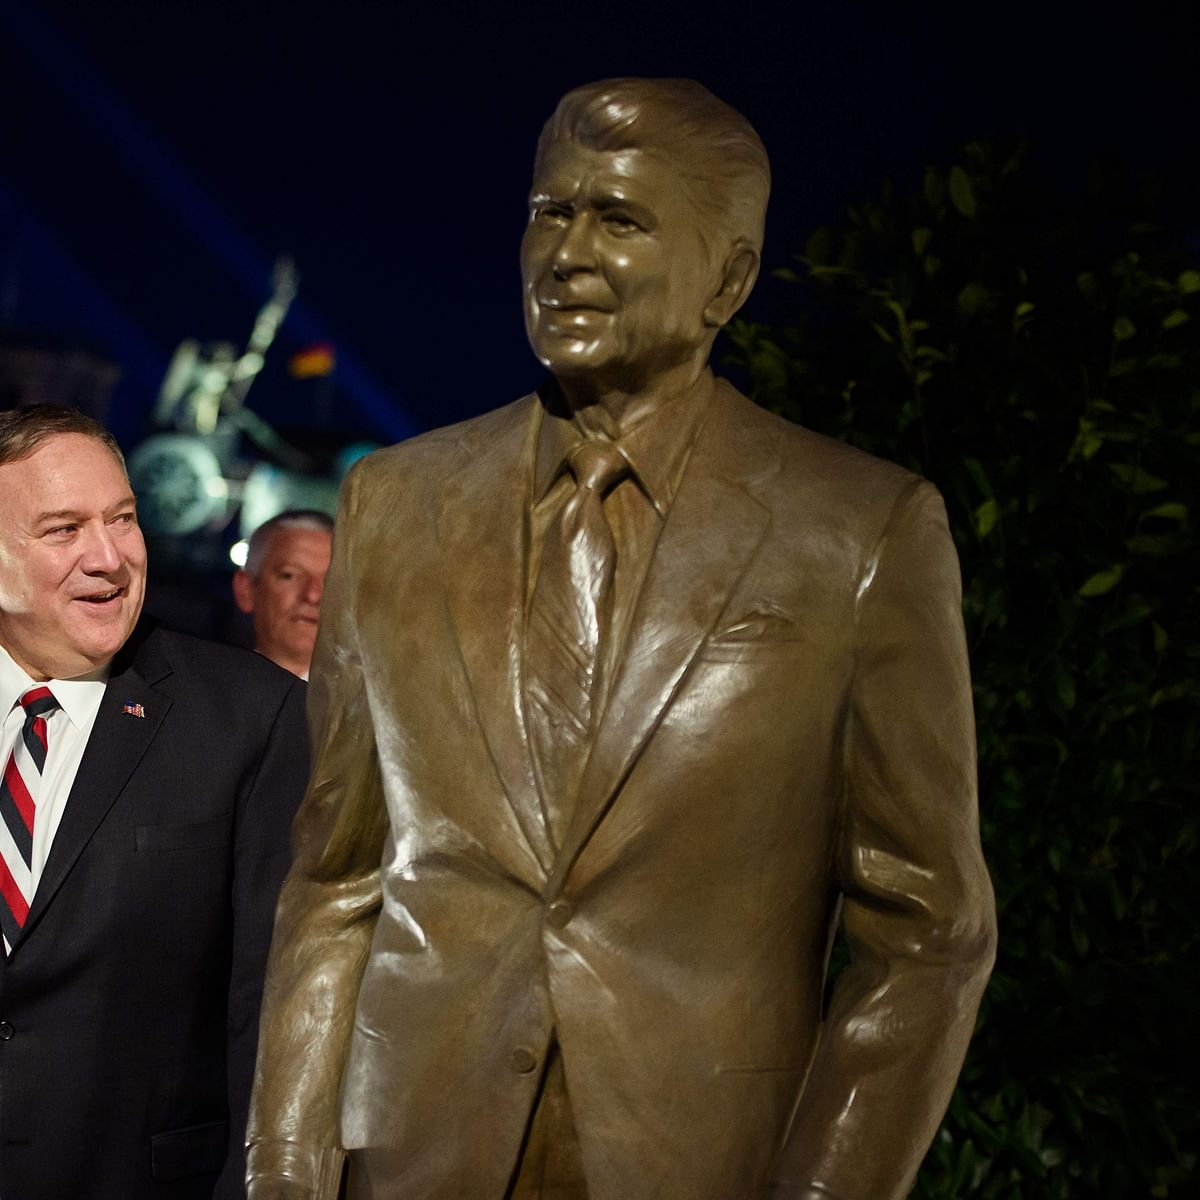 Berlin unveils late US Prez Ronald Reagan's statue